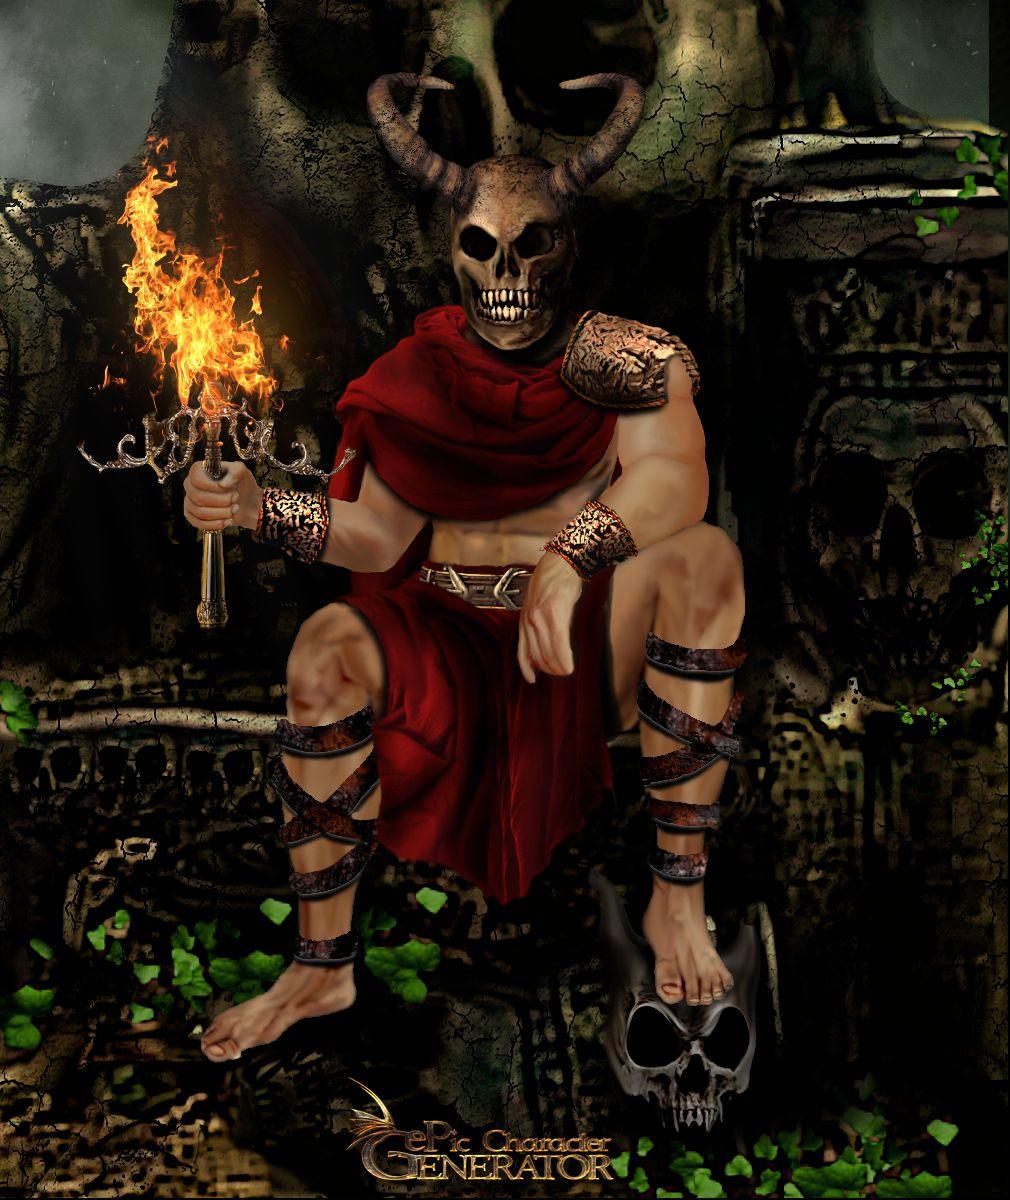 ePic Character Generator Season 3 Throne Savage Screenshot 5